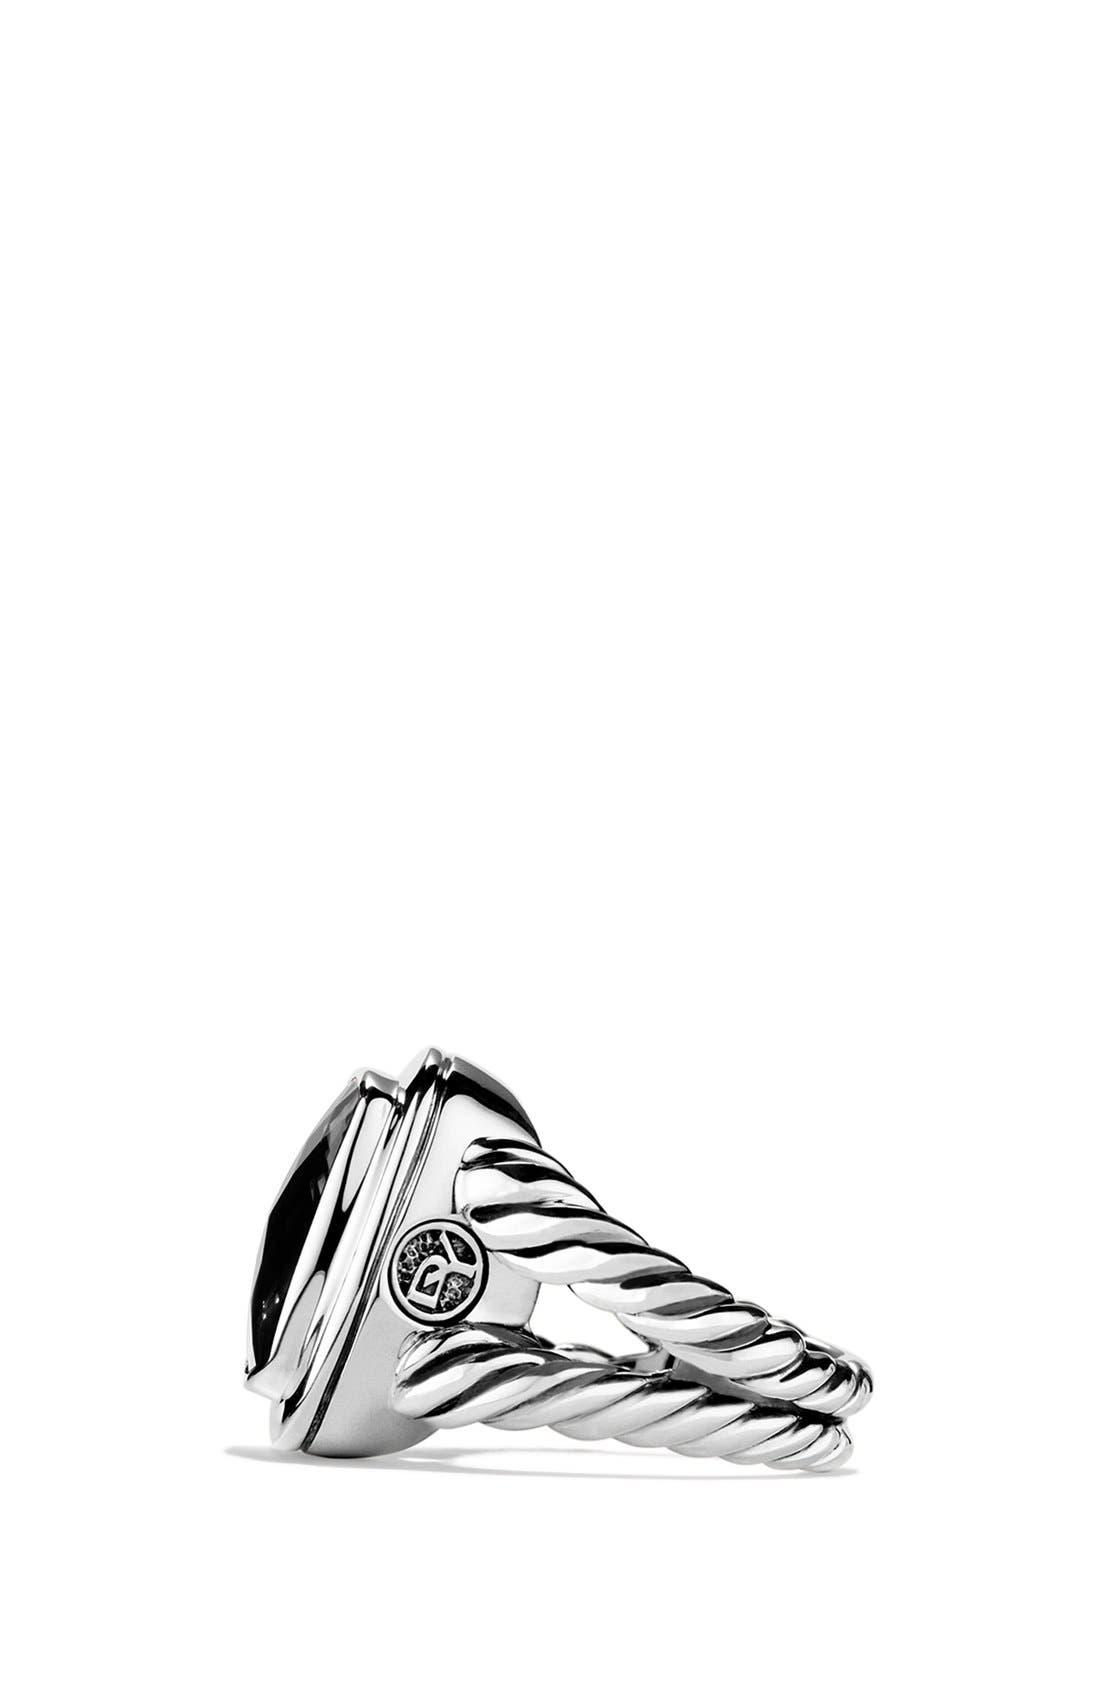 'Albion' Ring with Semiprecious Stone & Diamonds,                             Alternate thumbnail 2, color,                             001